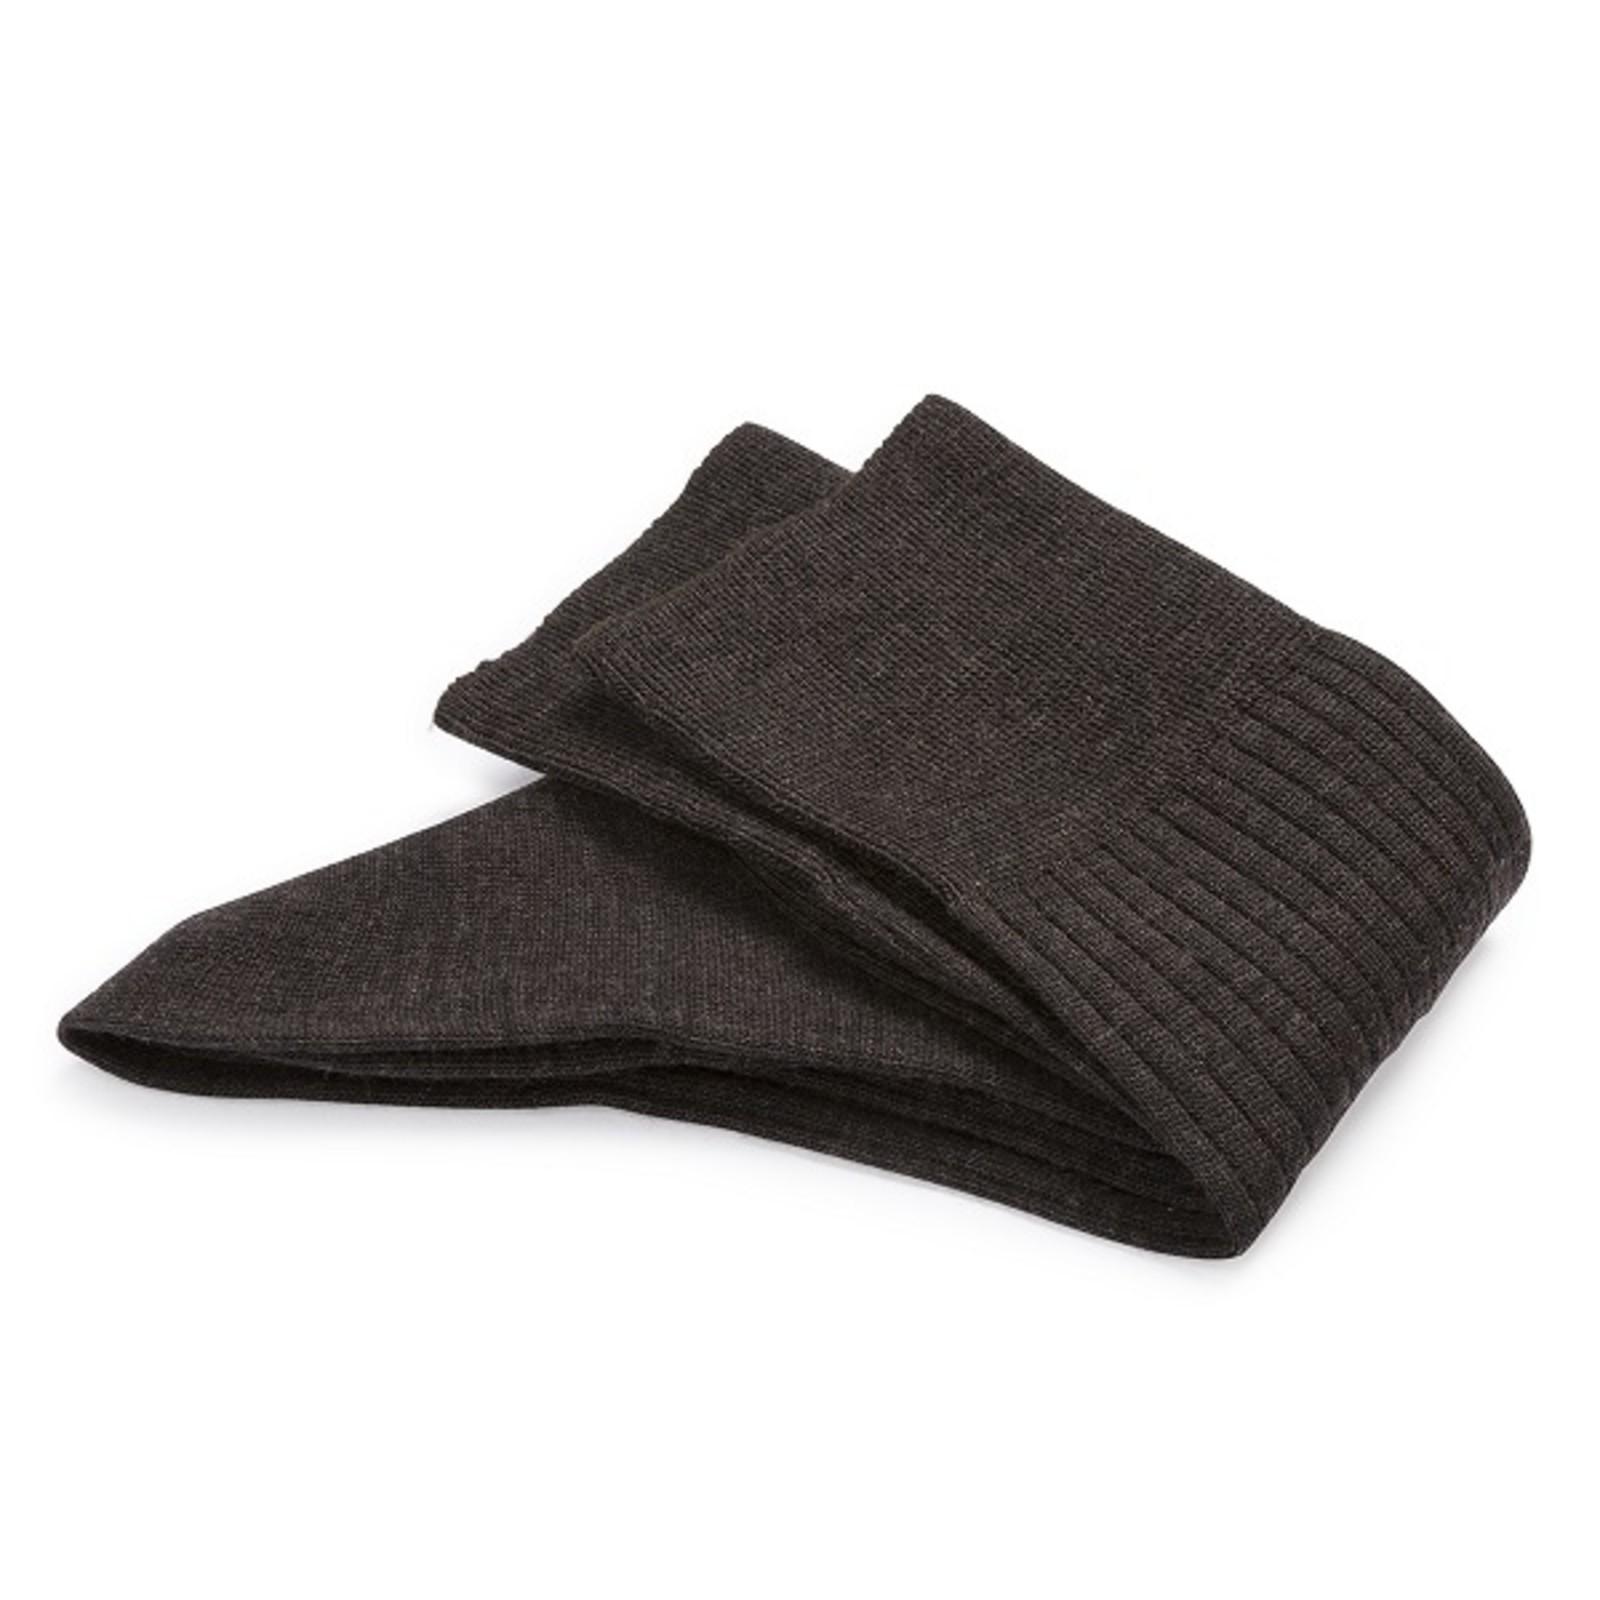 Carlo Lanza Dunkelbraune Merino Wolle Socken